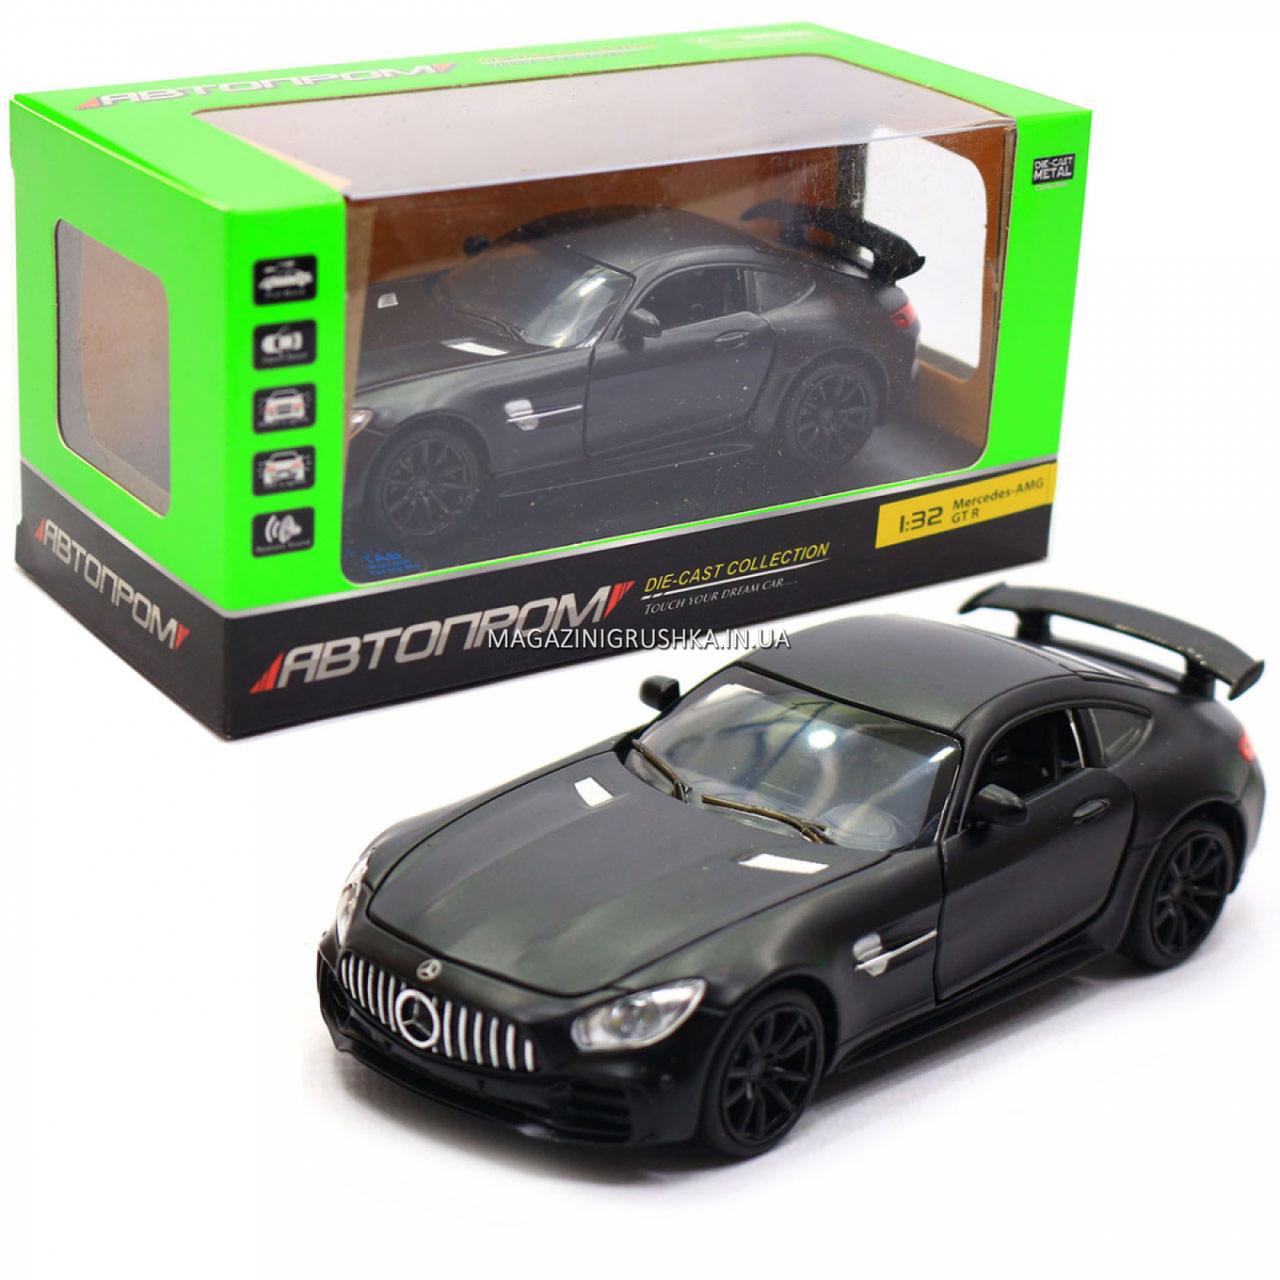 Машинка ігрова Автопром Мерседес (Mercedes-AMG GT-R), 14 см, чорний 7860